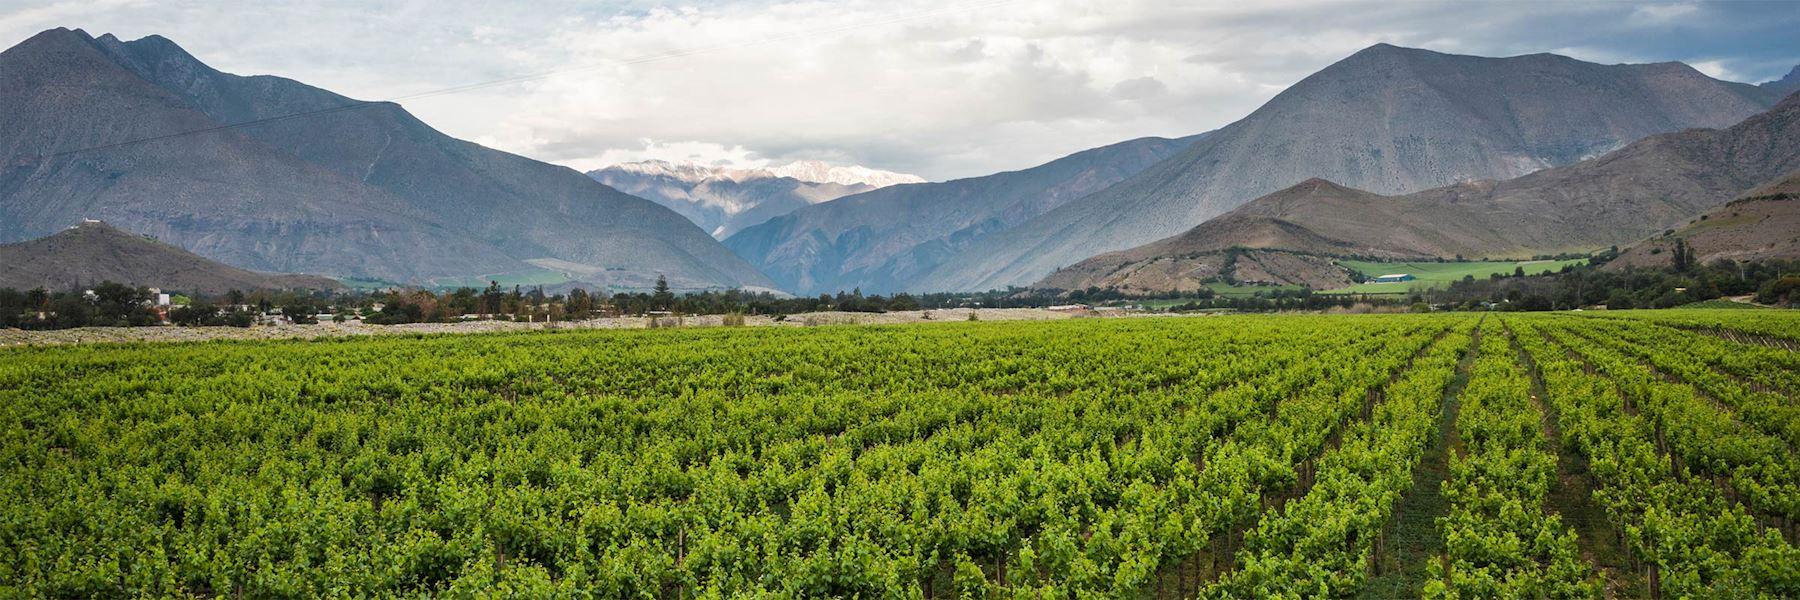 Visit Elqui Valley, Chile